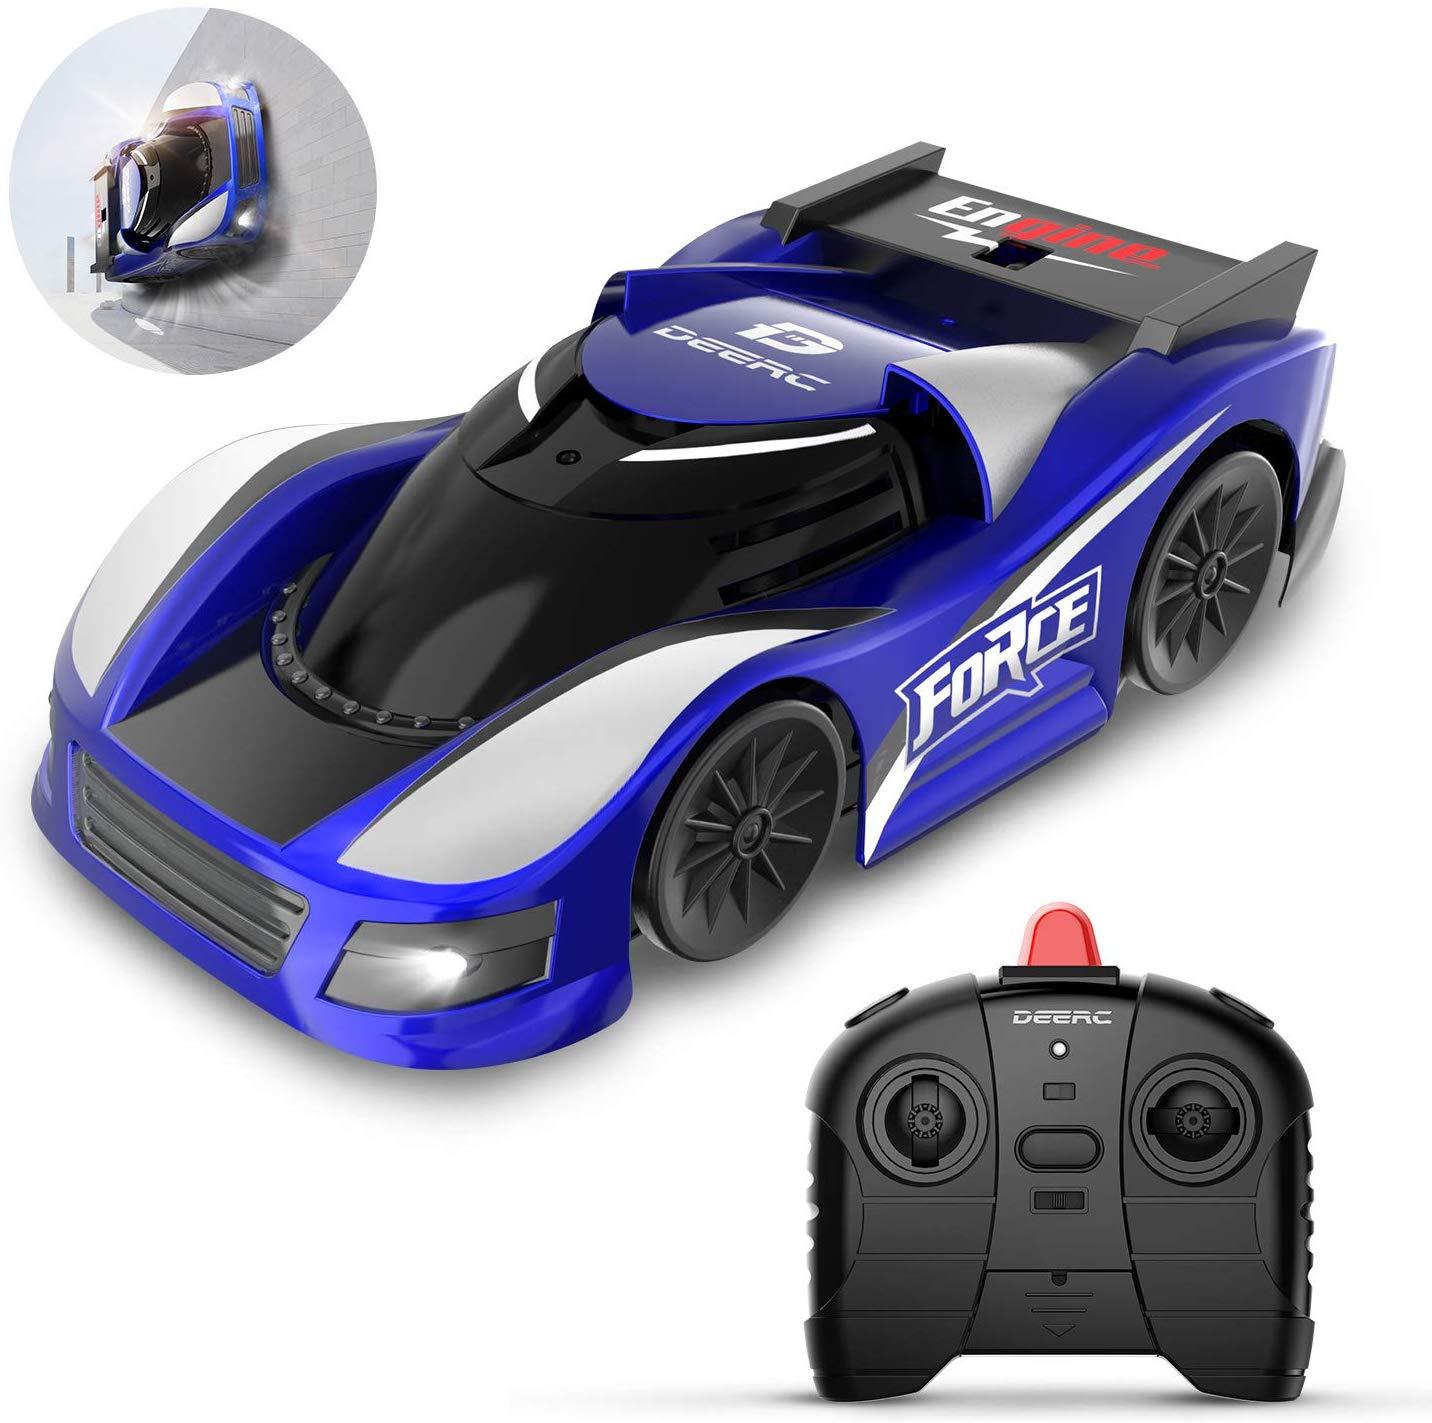 5 Pieces 3 Channels Car RC 2 Leds Light Control Switch for RC Vehicles Car